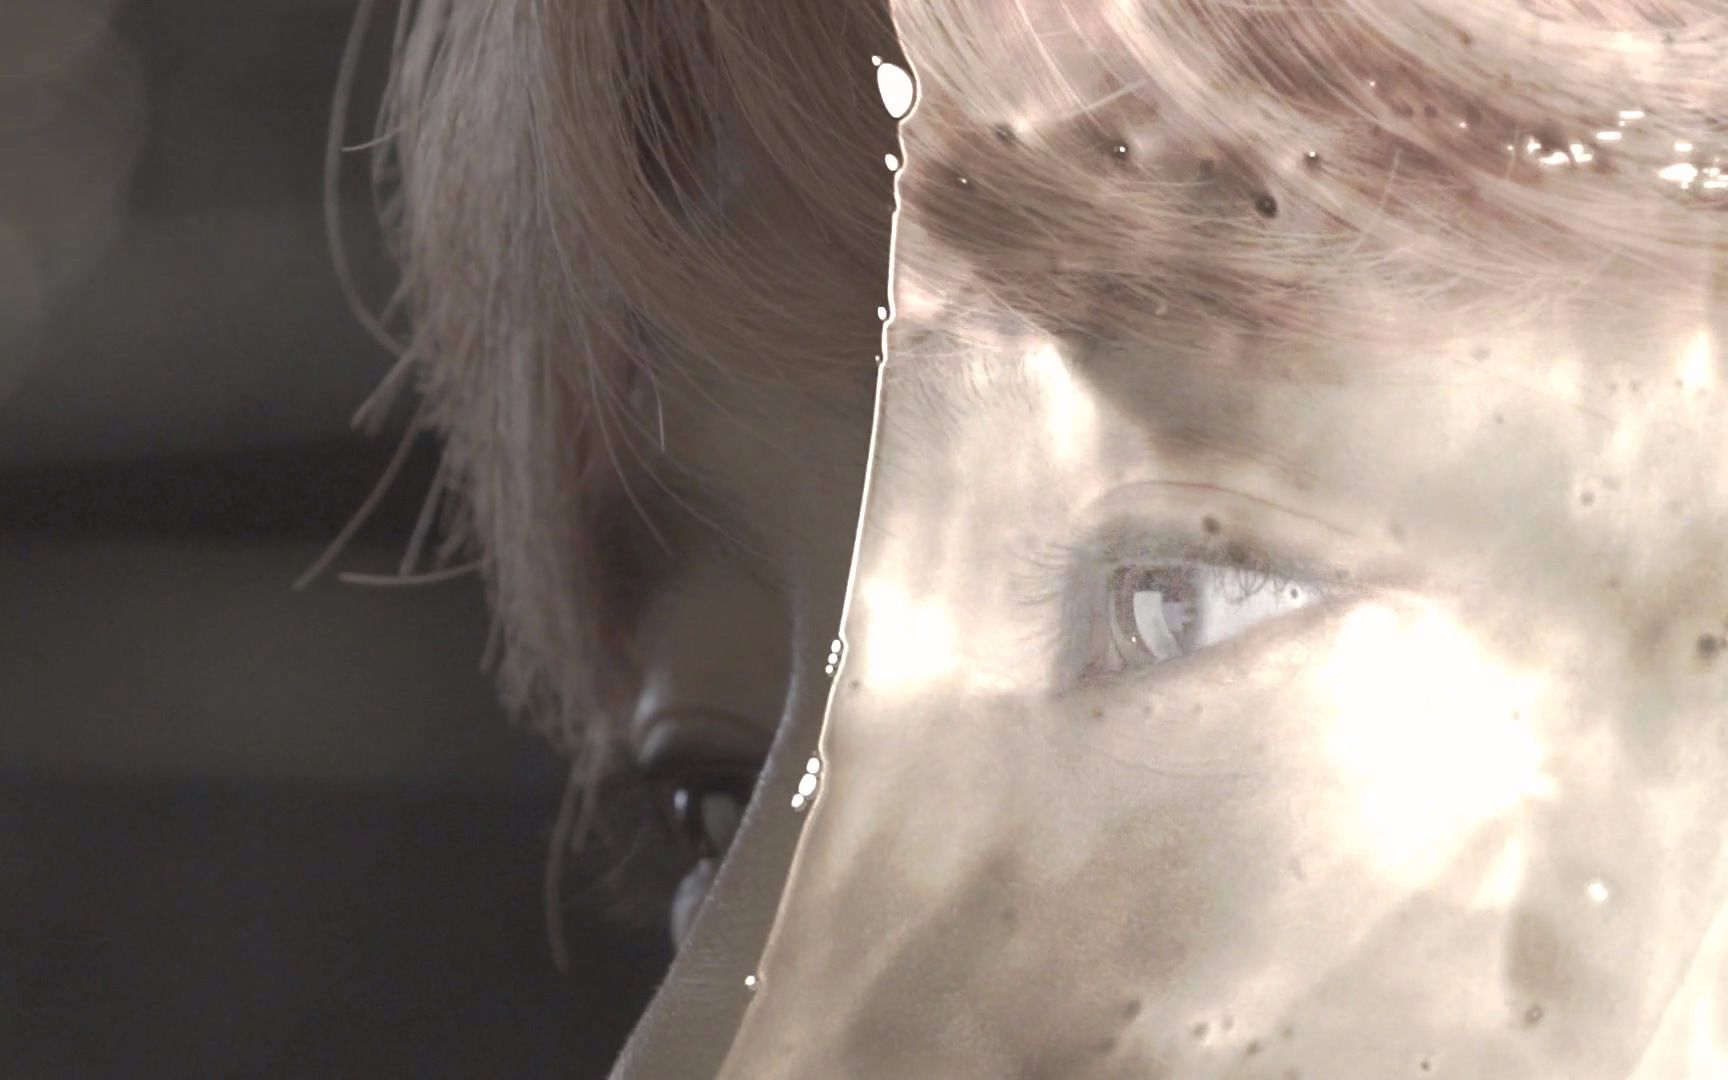 xplore下载_【鹿晗】mini数字专辑《xplore》之《catch it》概念宣传片